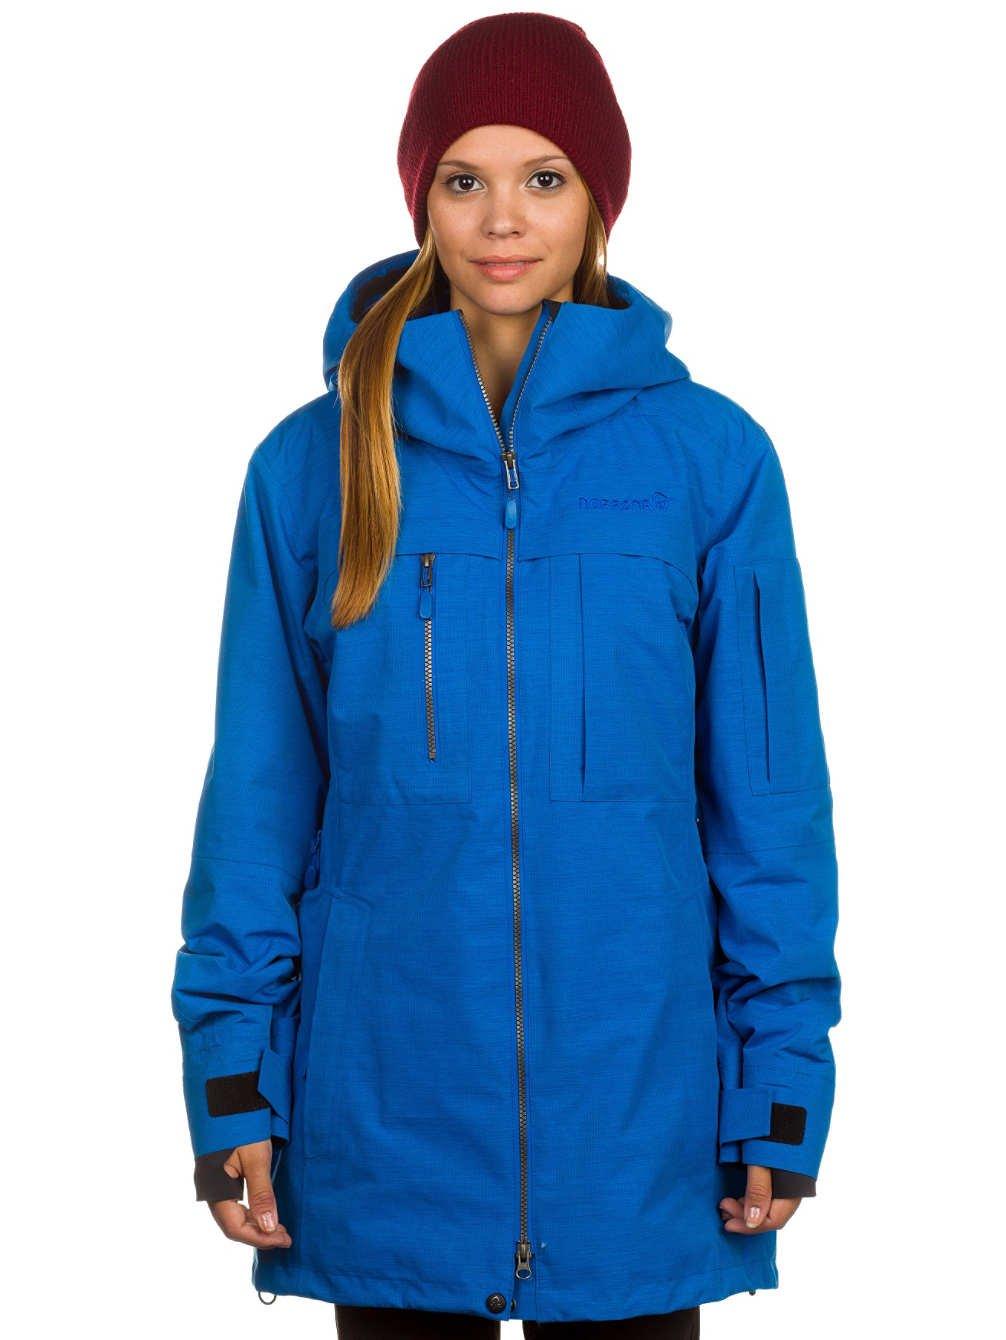 Damen Snowboard Jacke Norrona Roldal Gore Tex Prima Loft Jacket günstig kaufen